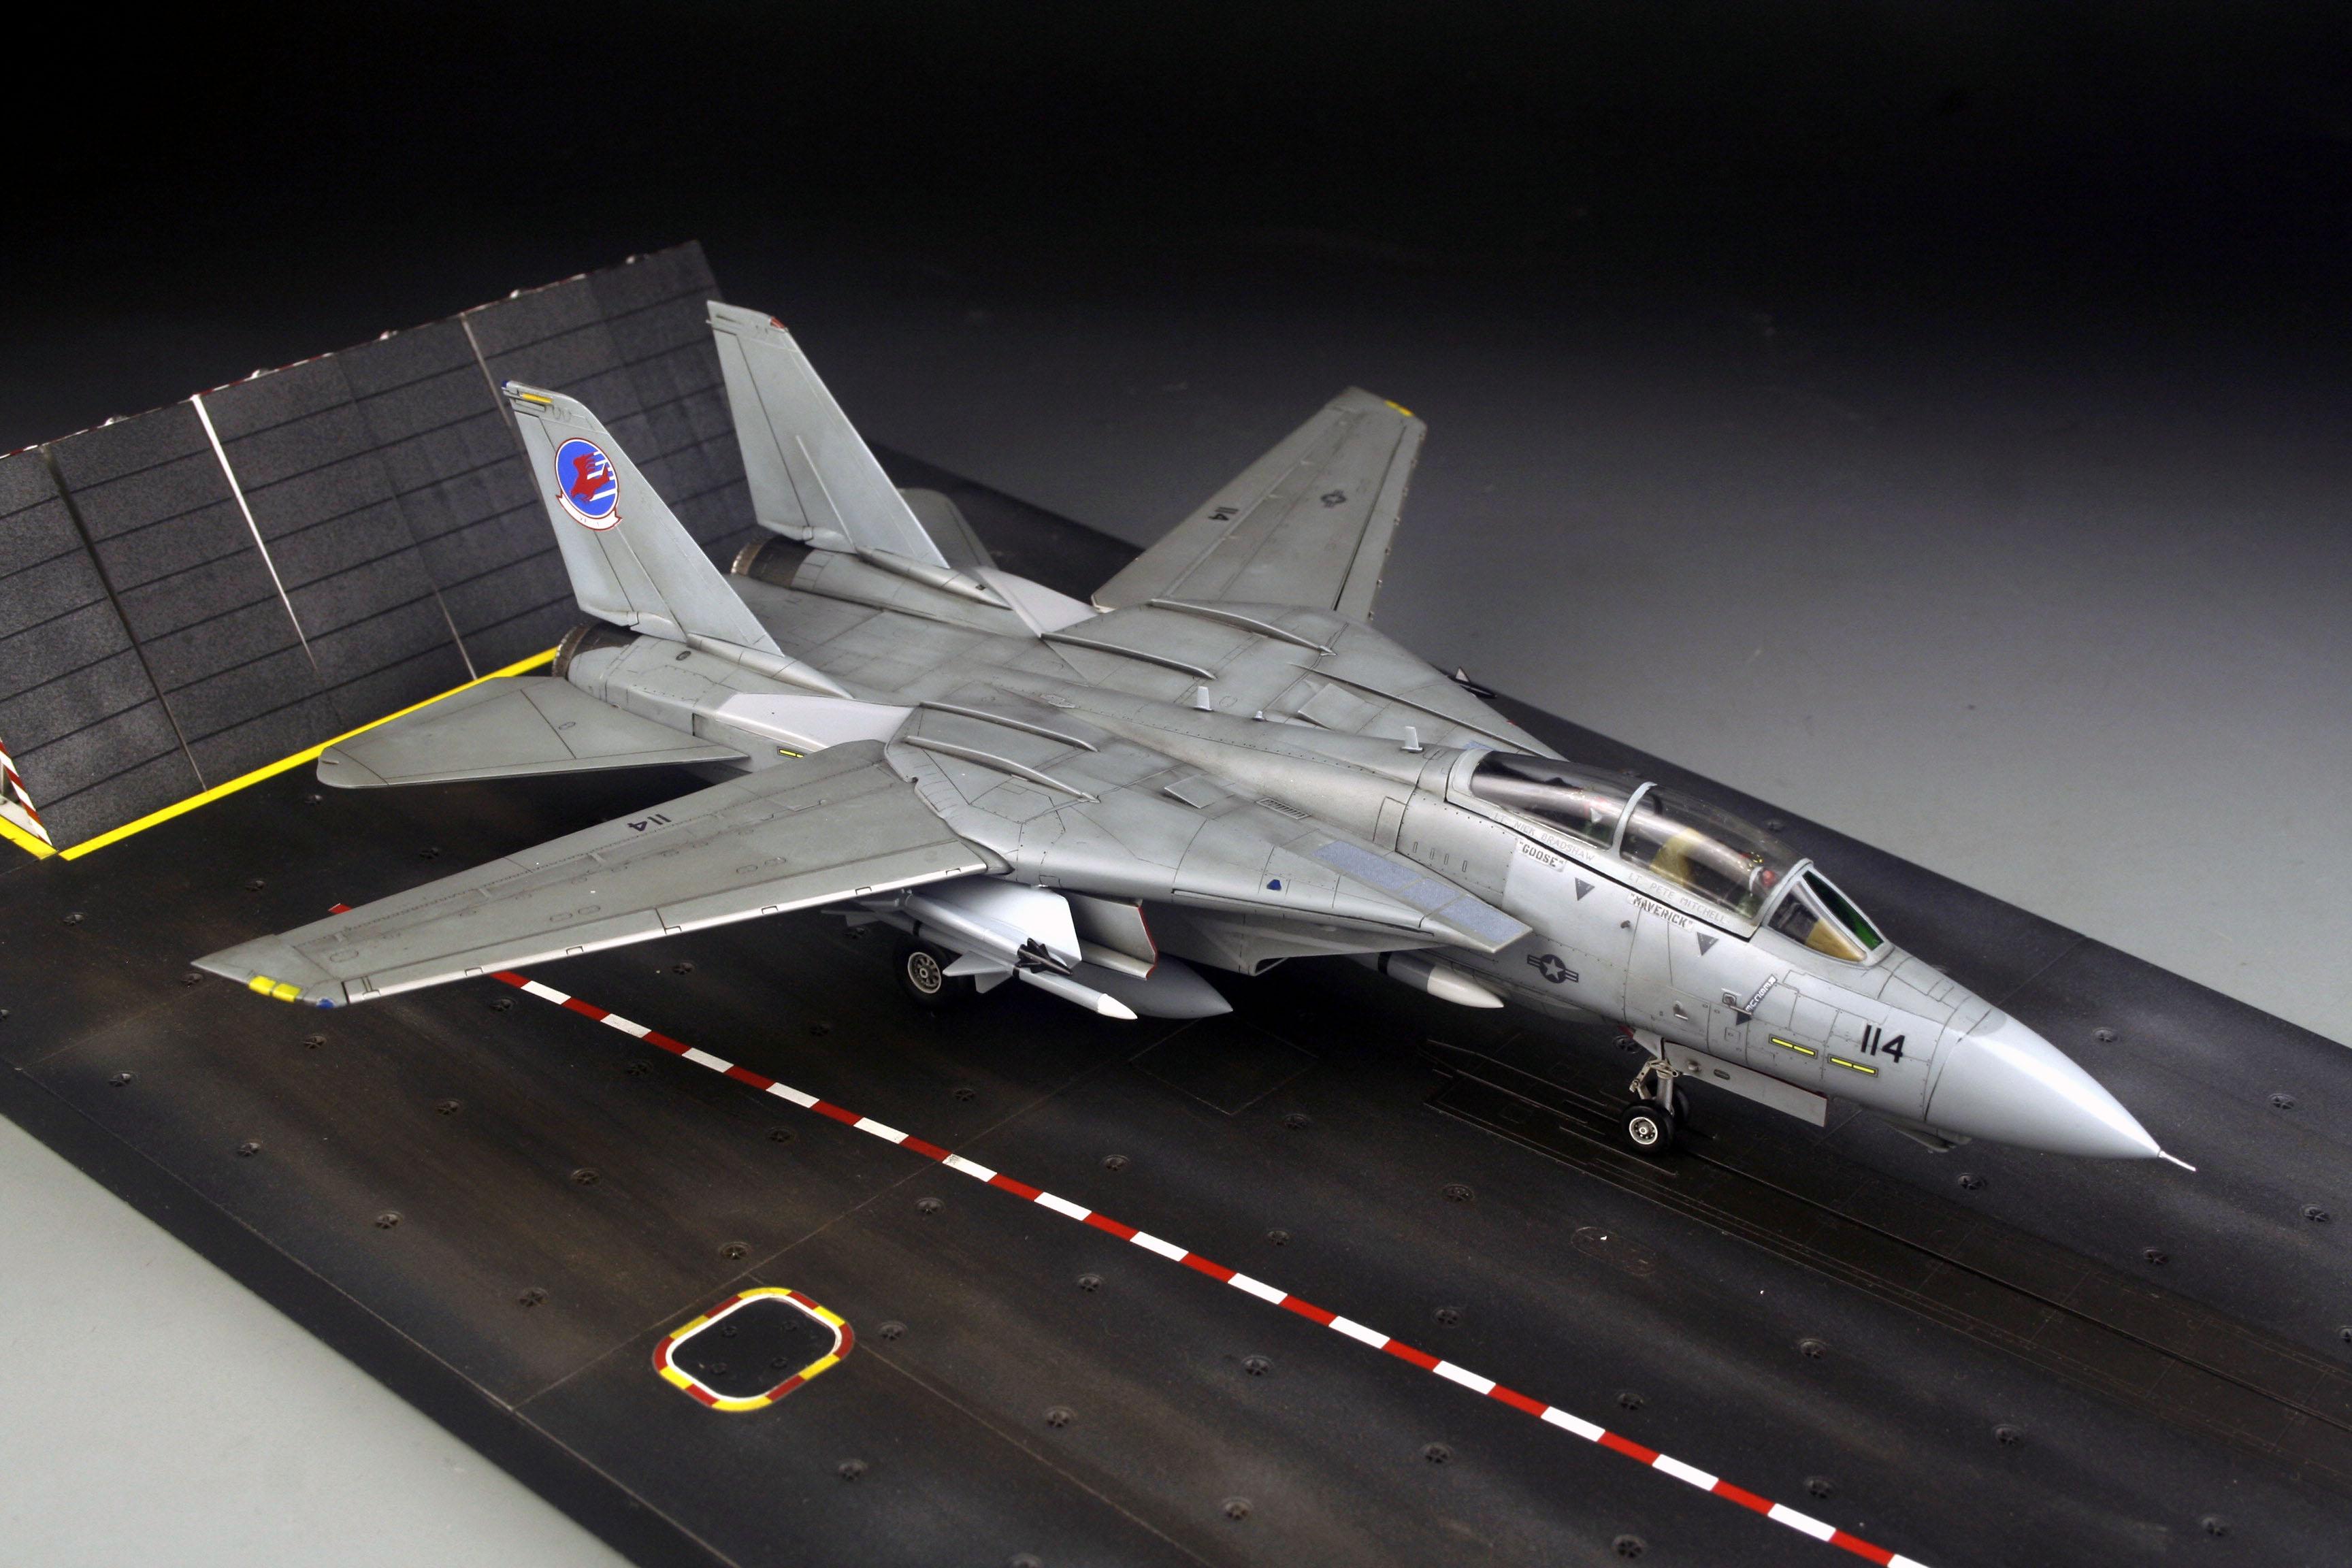 Award Winner Built 172 F 14 Tomcat Top Gun Movie DioramaDeckTom 3456x2304